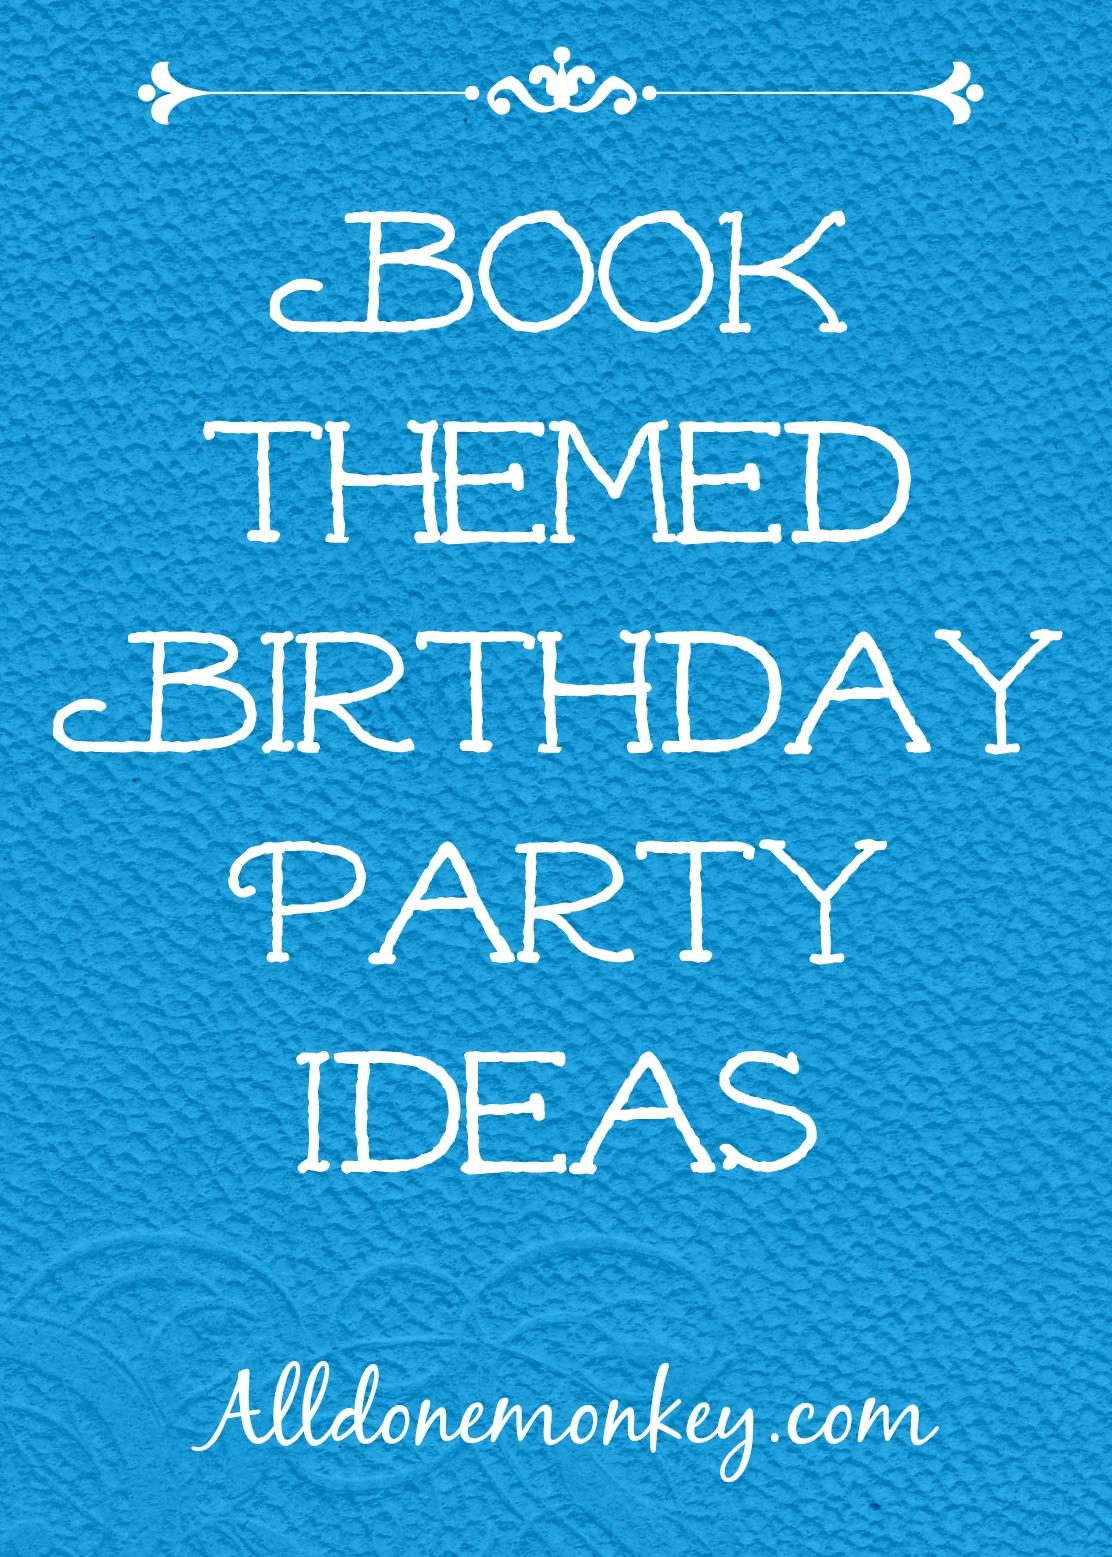 Book-Themed Birthday Party Ideas | Alldonemonkey.com